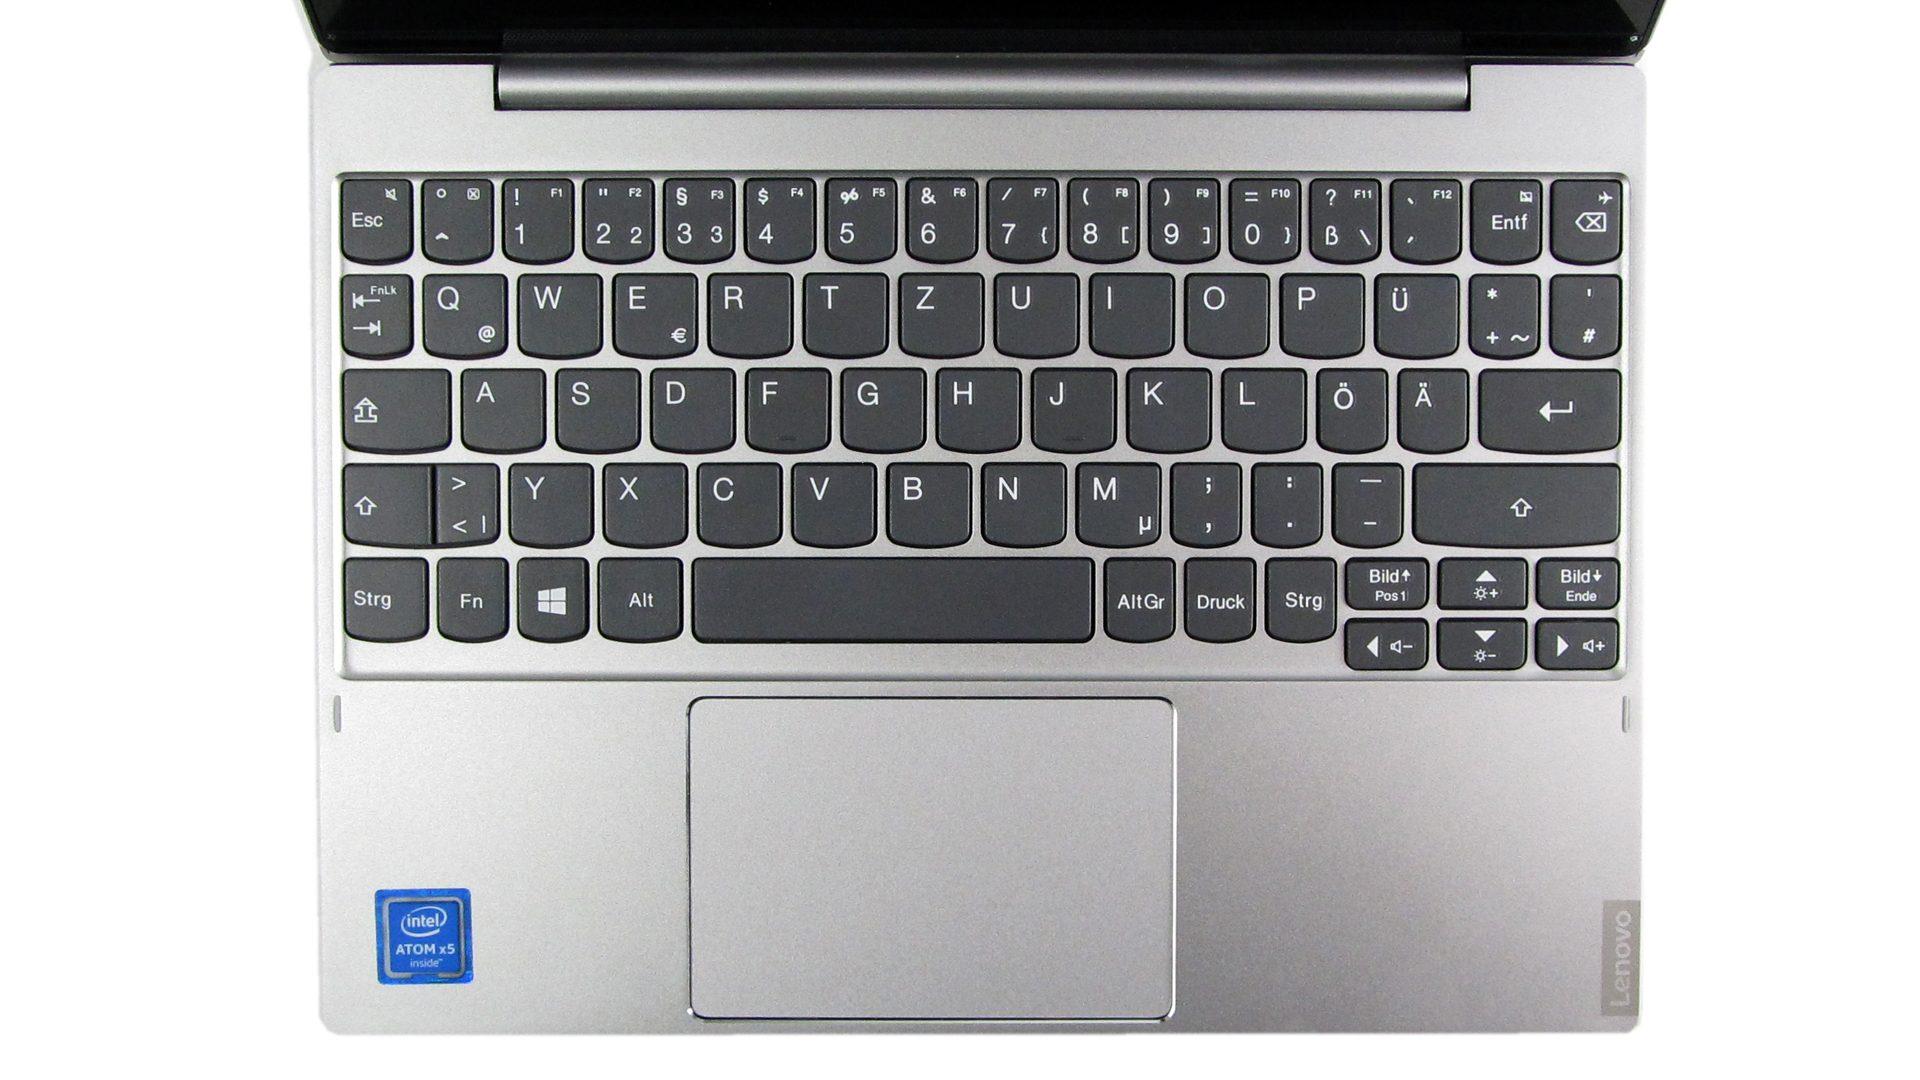 Lenovo-MIX-320-10ICR_Tastatur_1